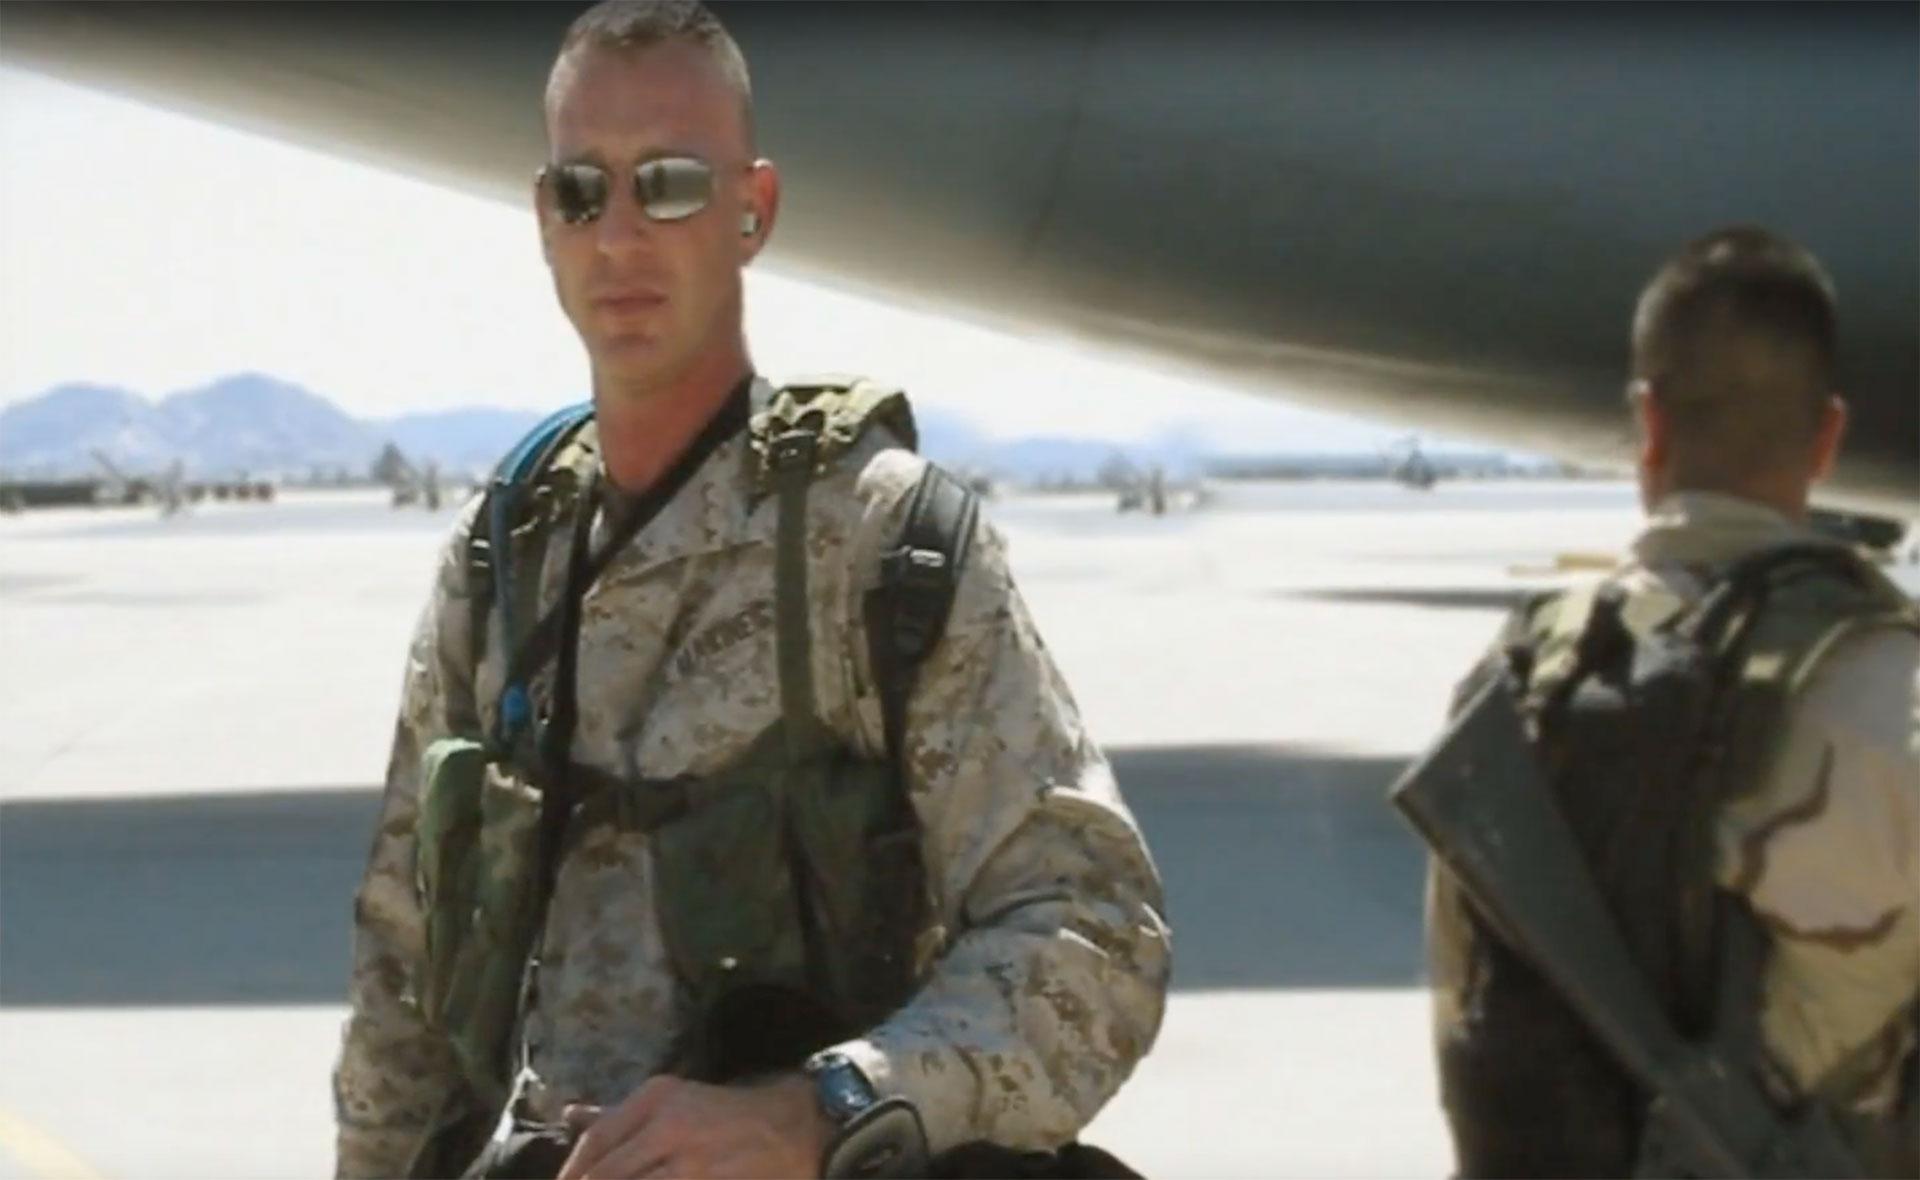 Semper Fi, One Marine's Journey